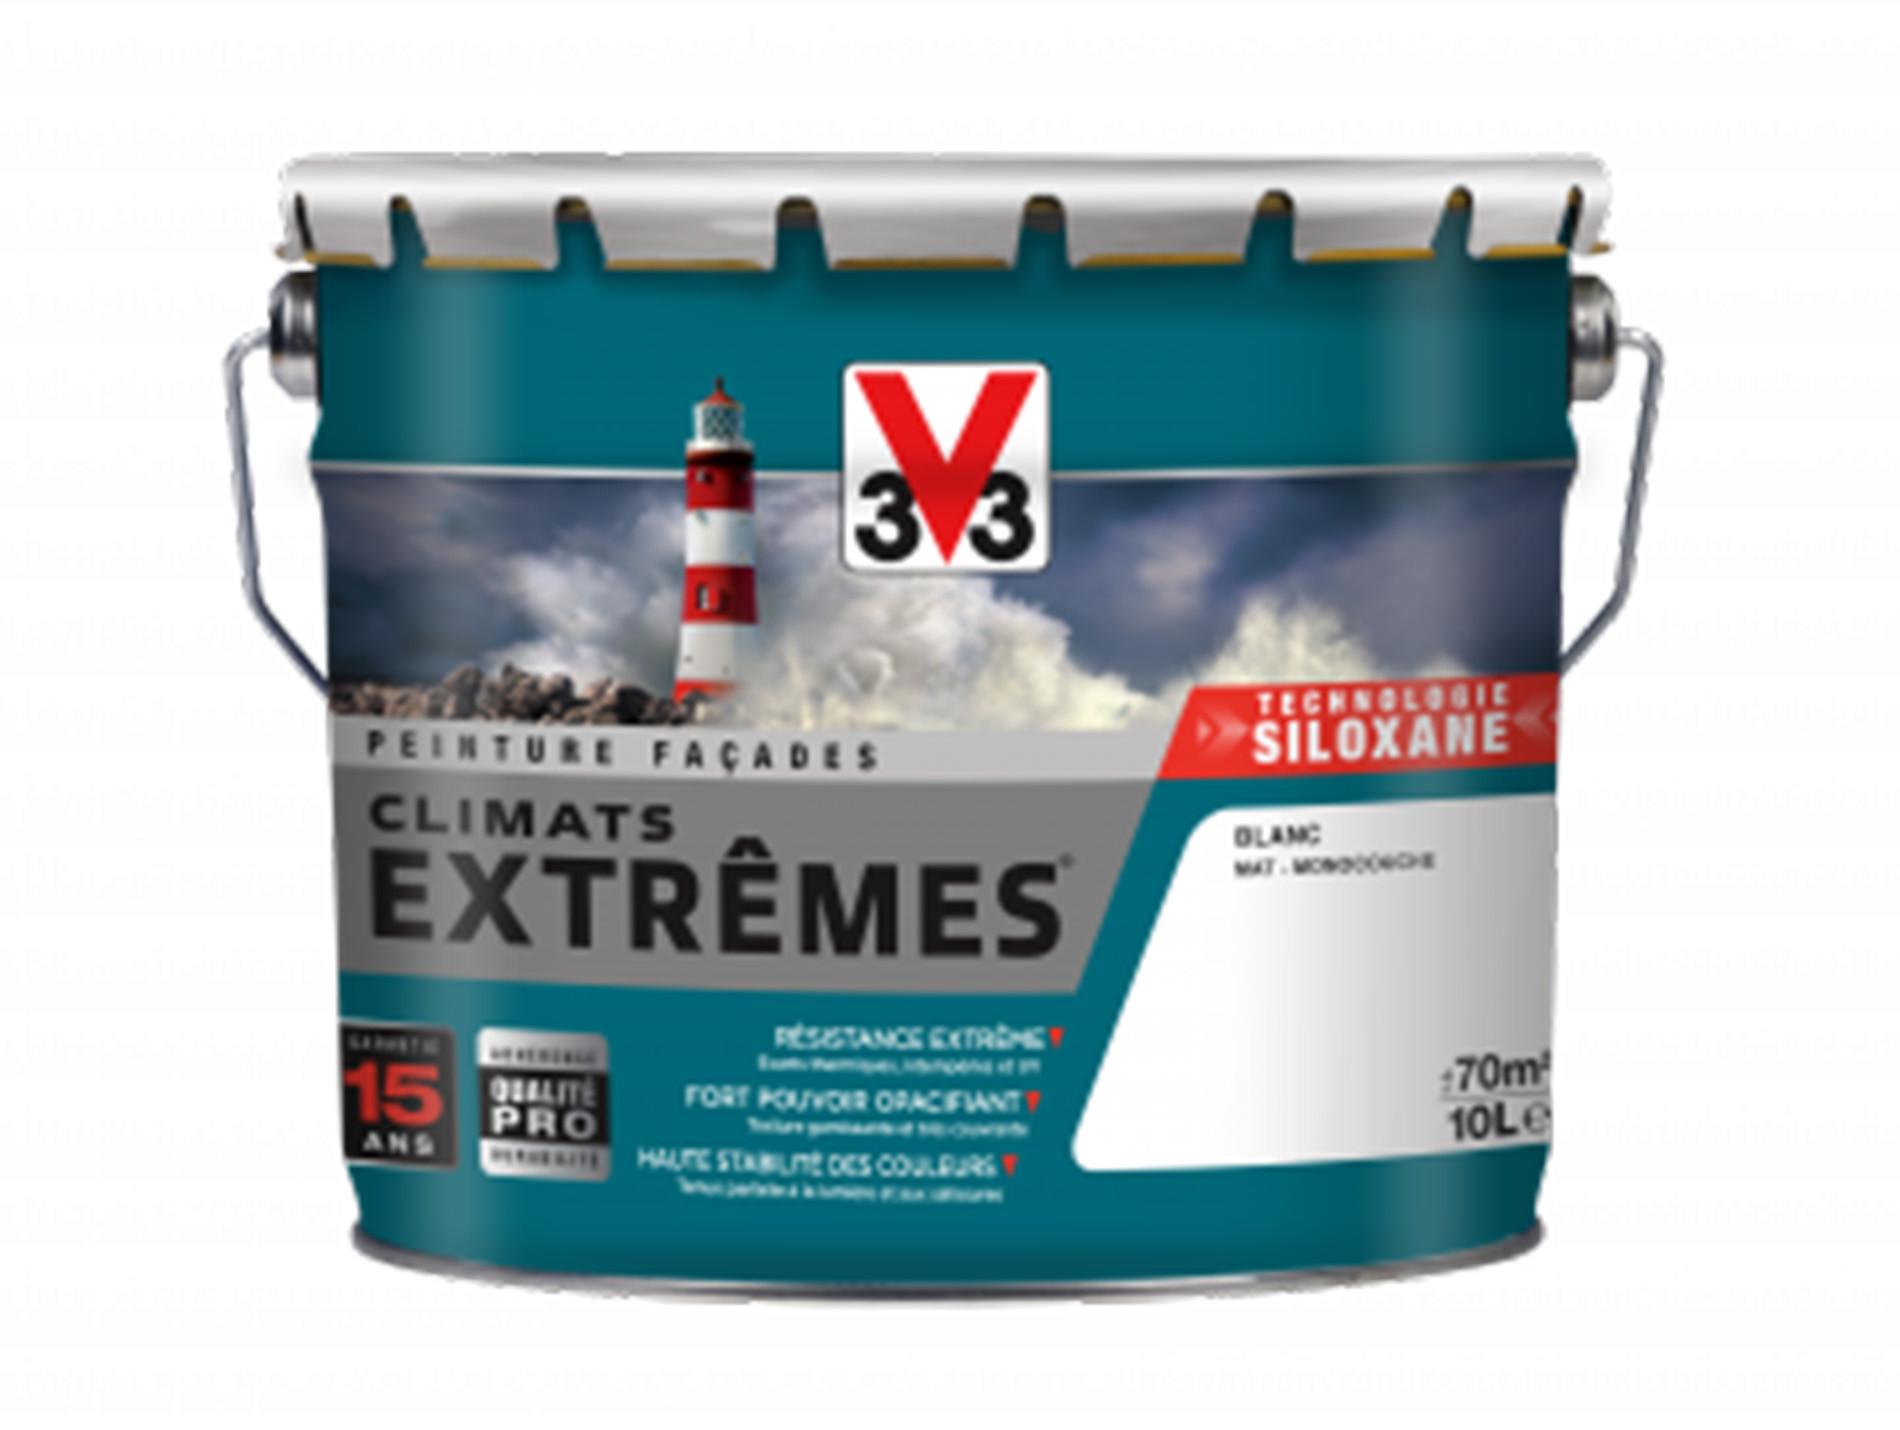 Peinture façades Climats Extrêmes® V33 Blanc Pur 10L